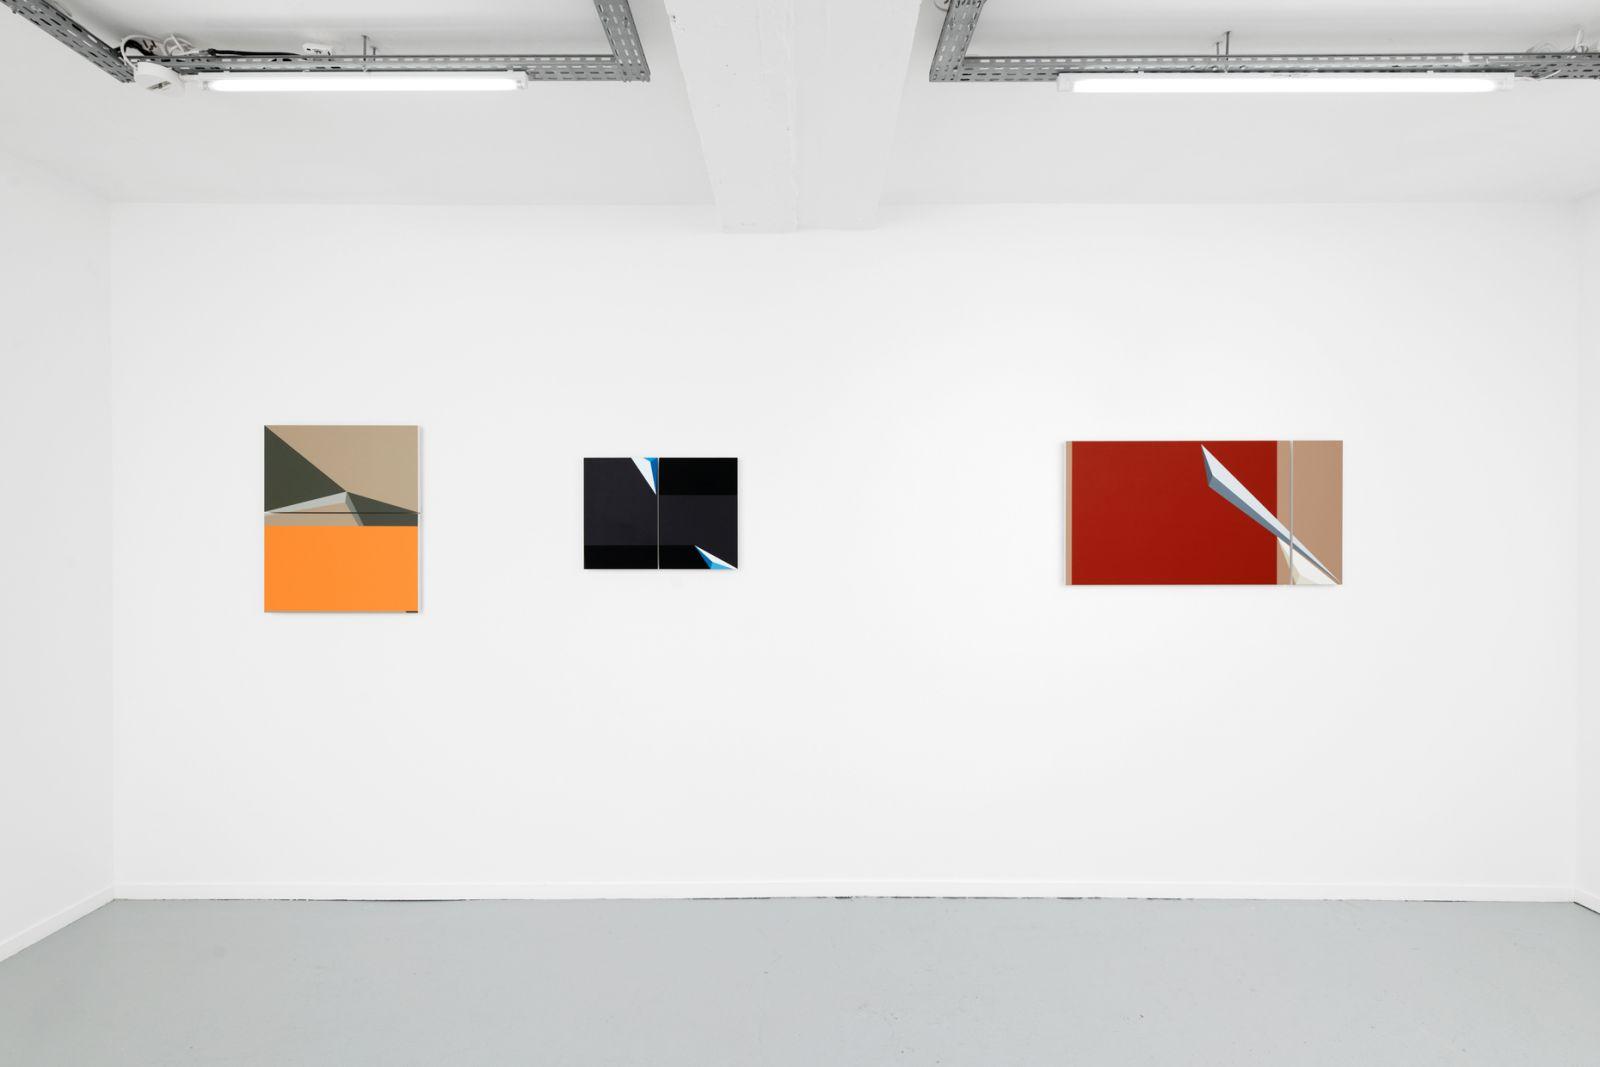 02-parties-fines-progress-gallery-vue-expo-1-aurelien-mole-web-6437b7fcfde126147981acd9cb8be633